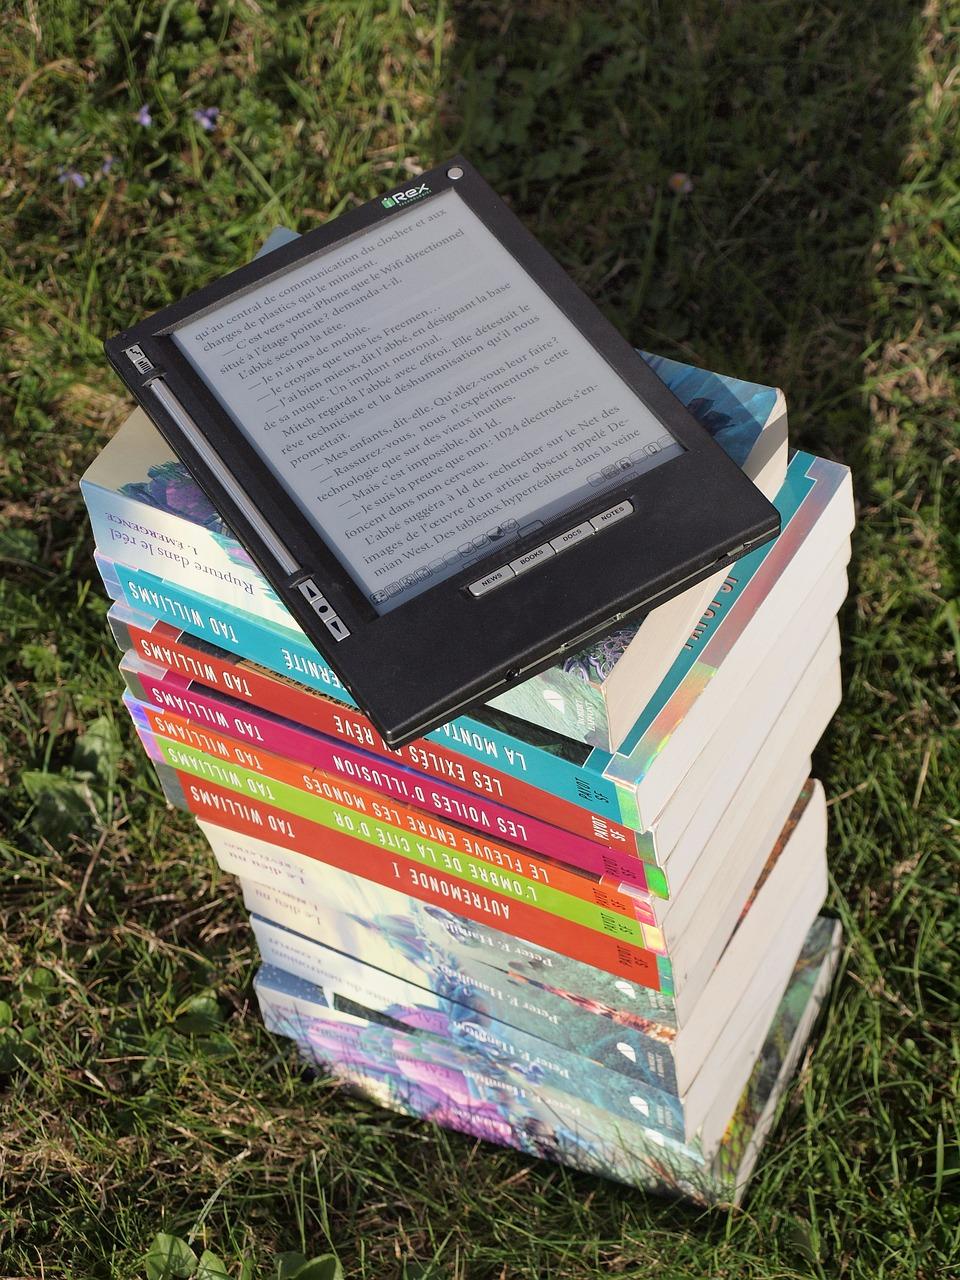 Books, Reading Relaxation, Irex, Iliad, E Book